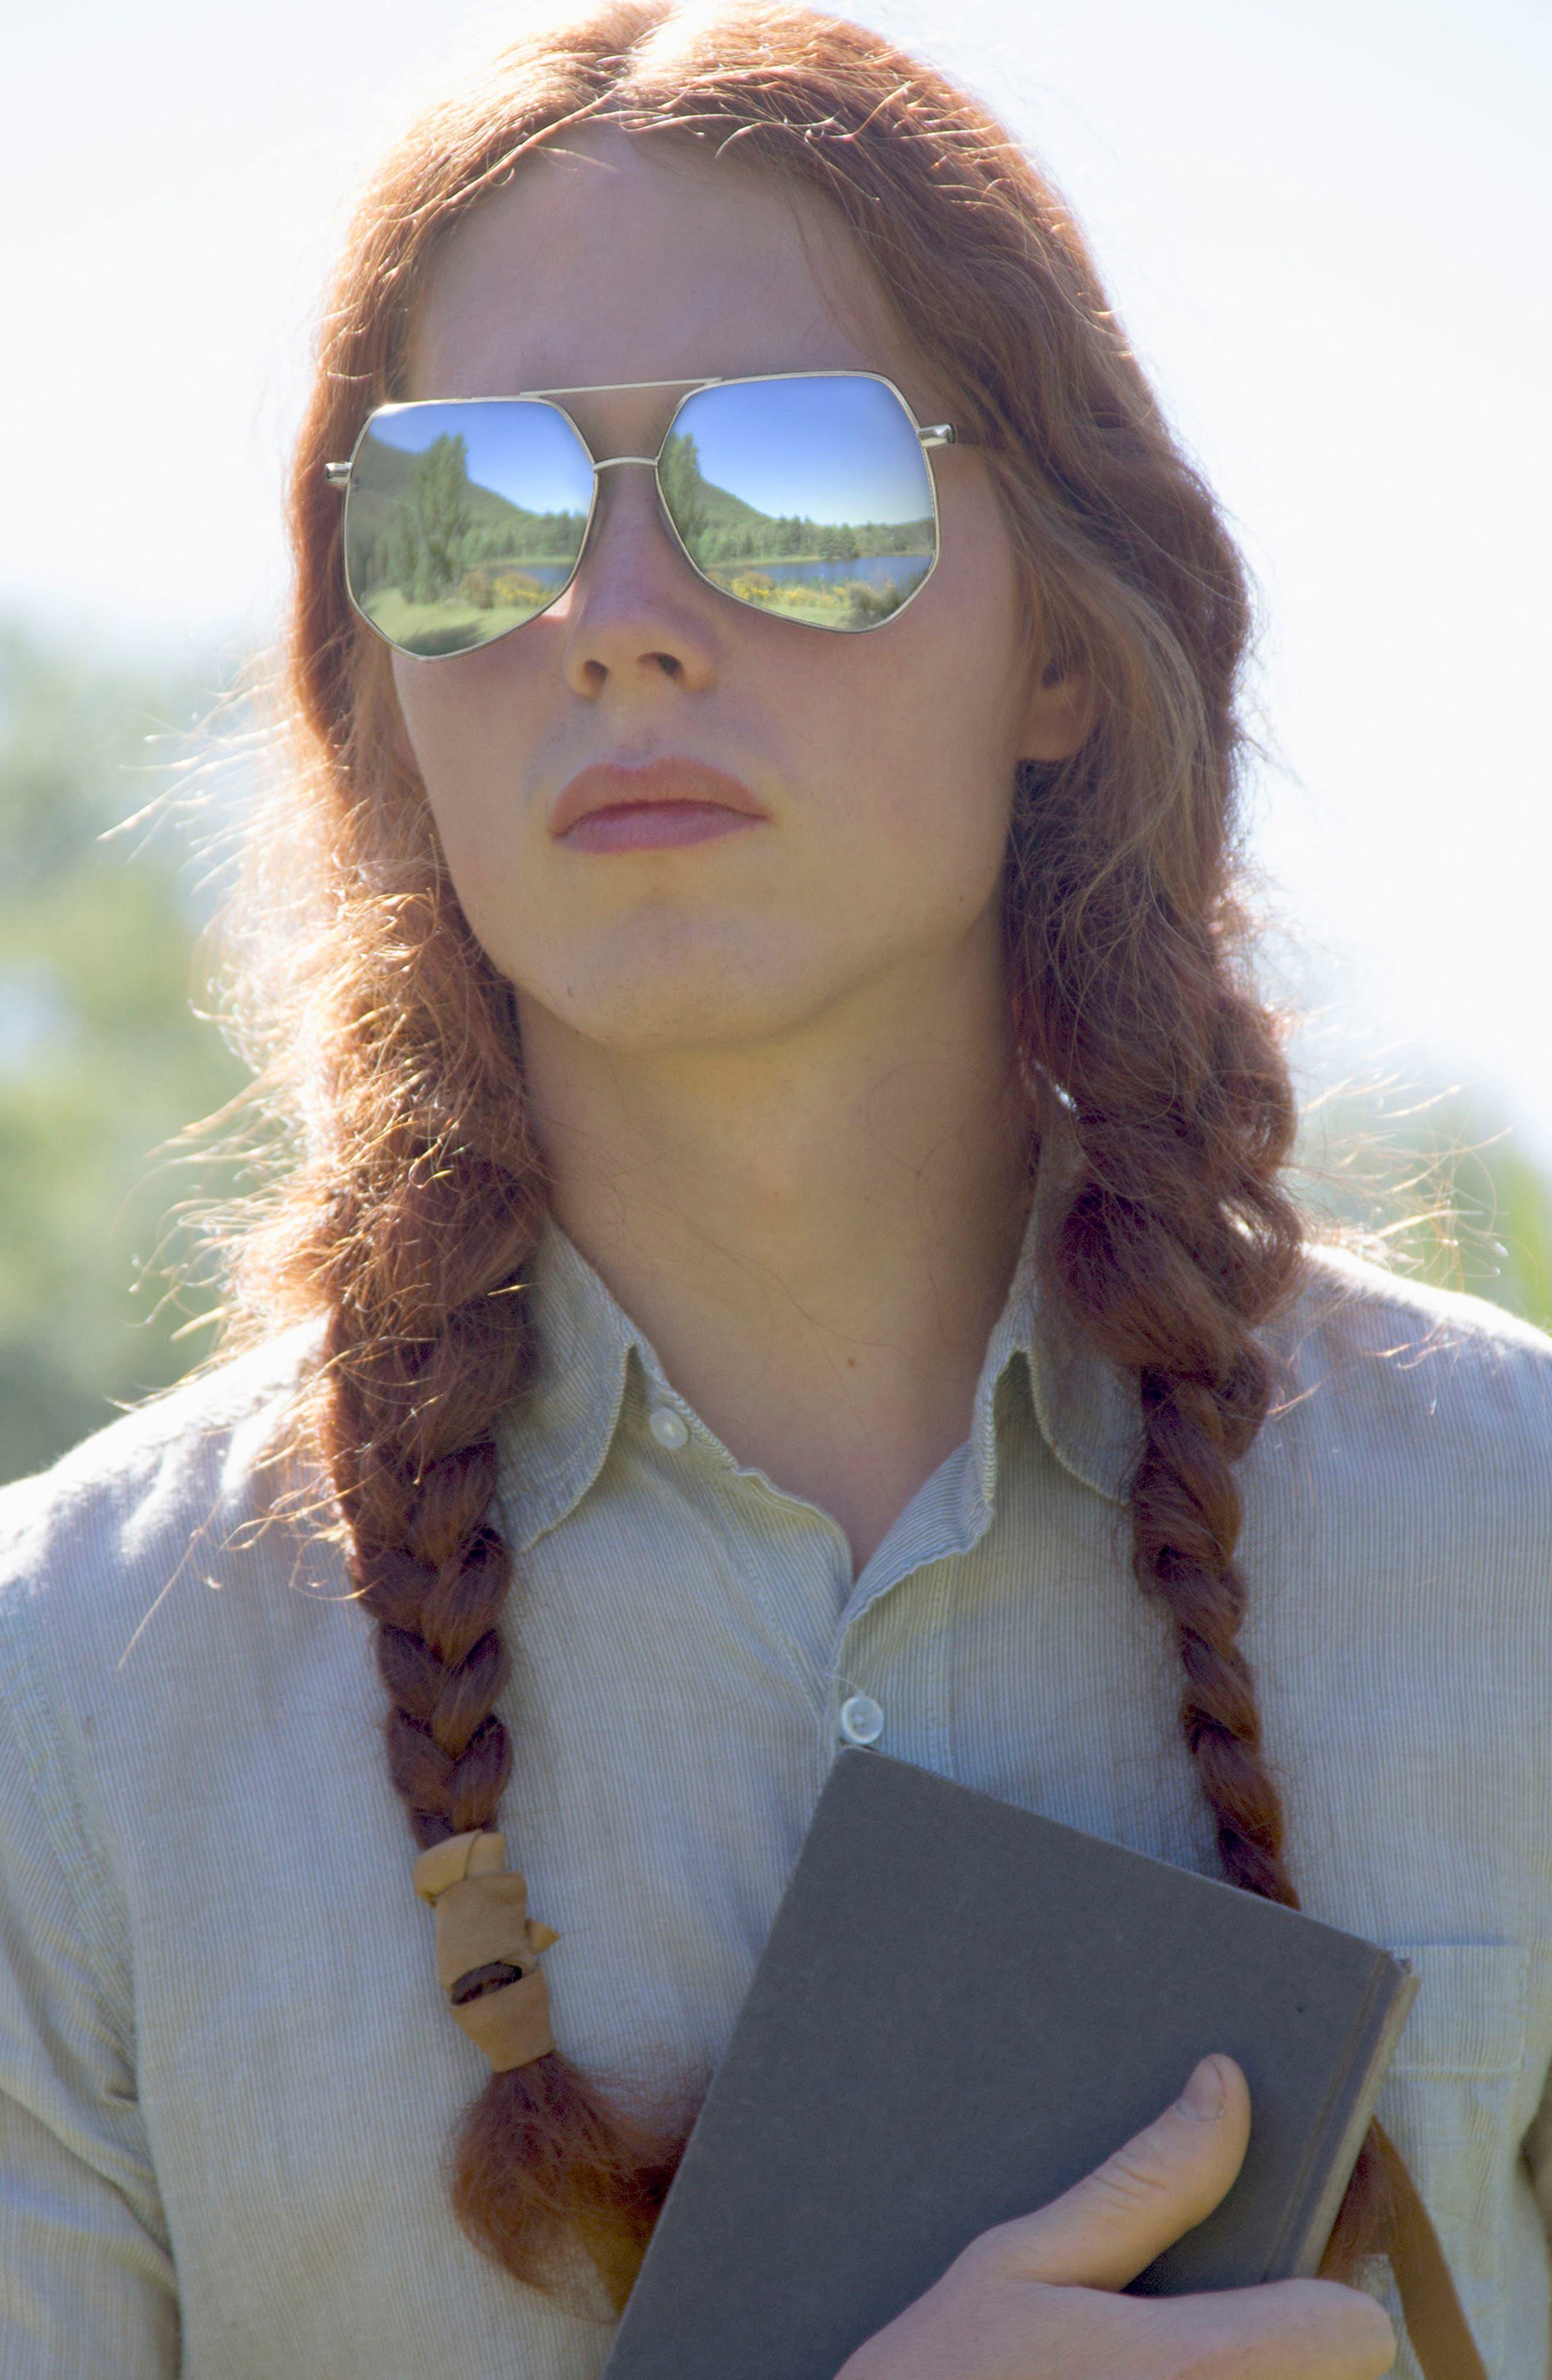 Megalast Flat 61mm Sunglasses,                             Alternate thumbnail 4, color,                             Copper Pink / Light Blue